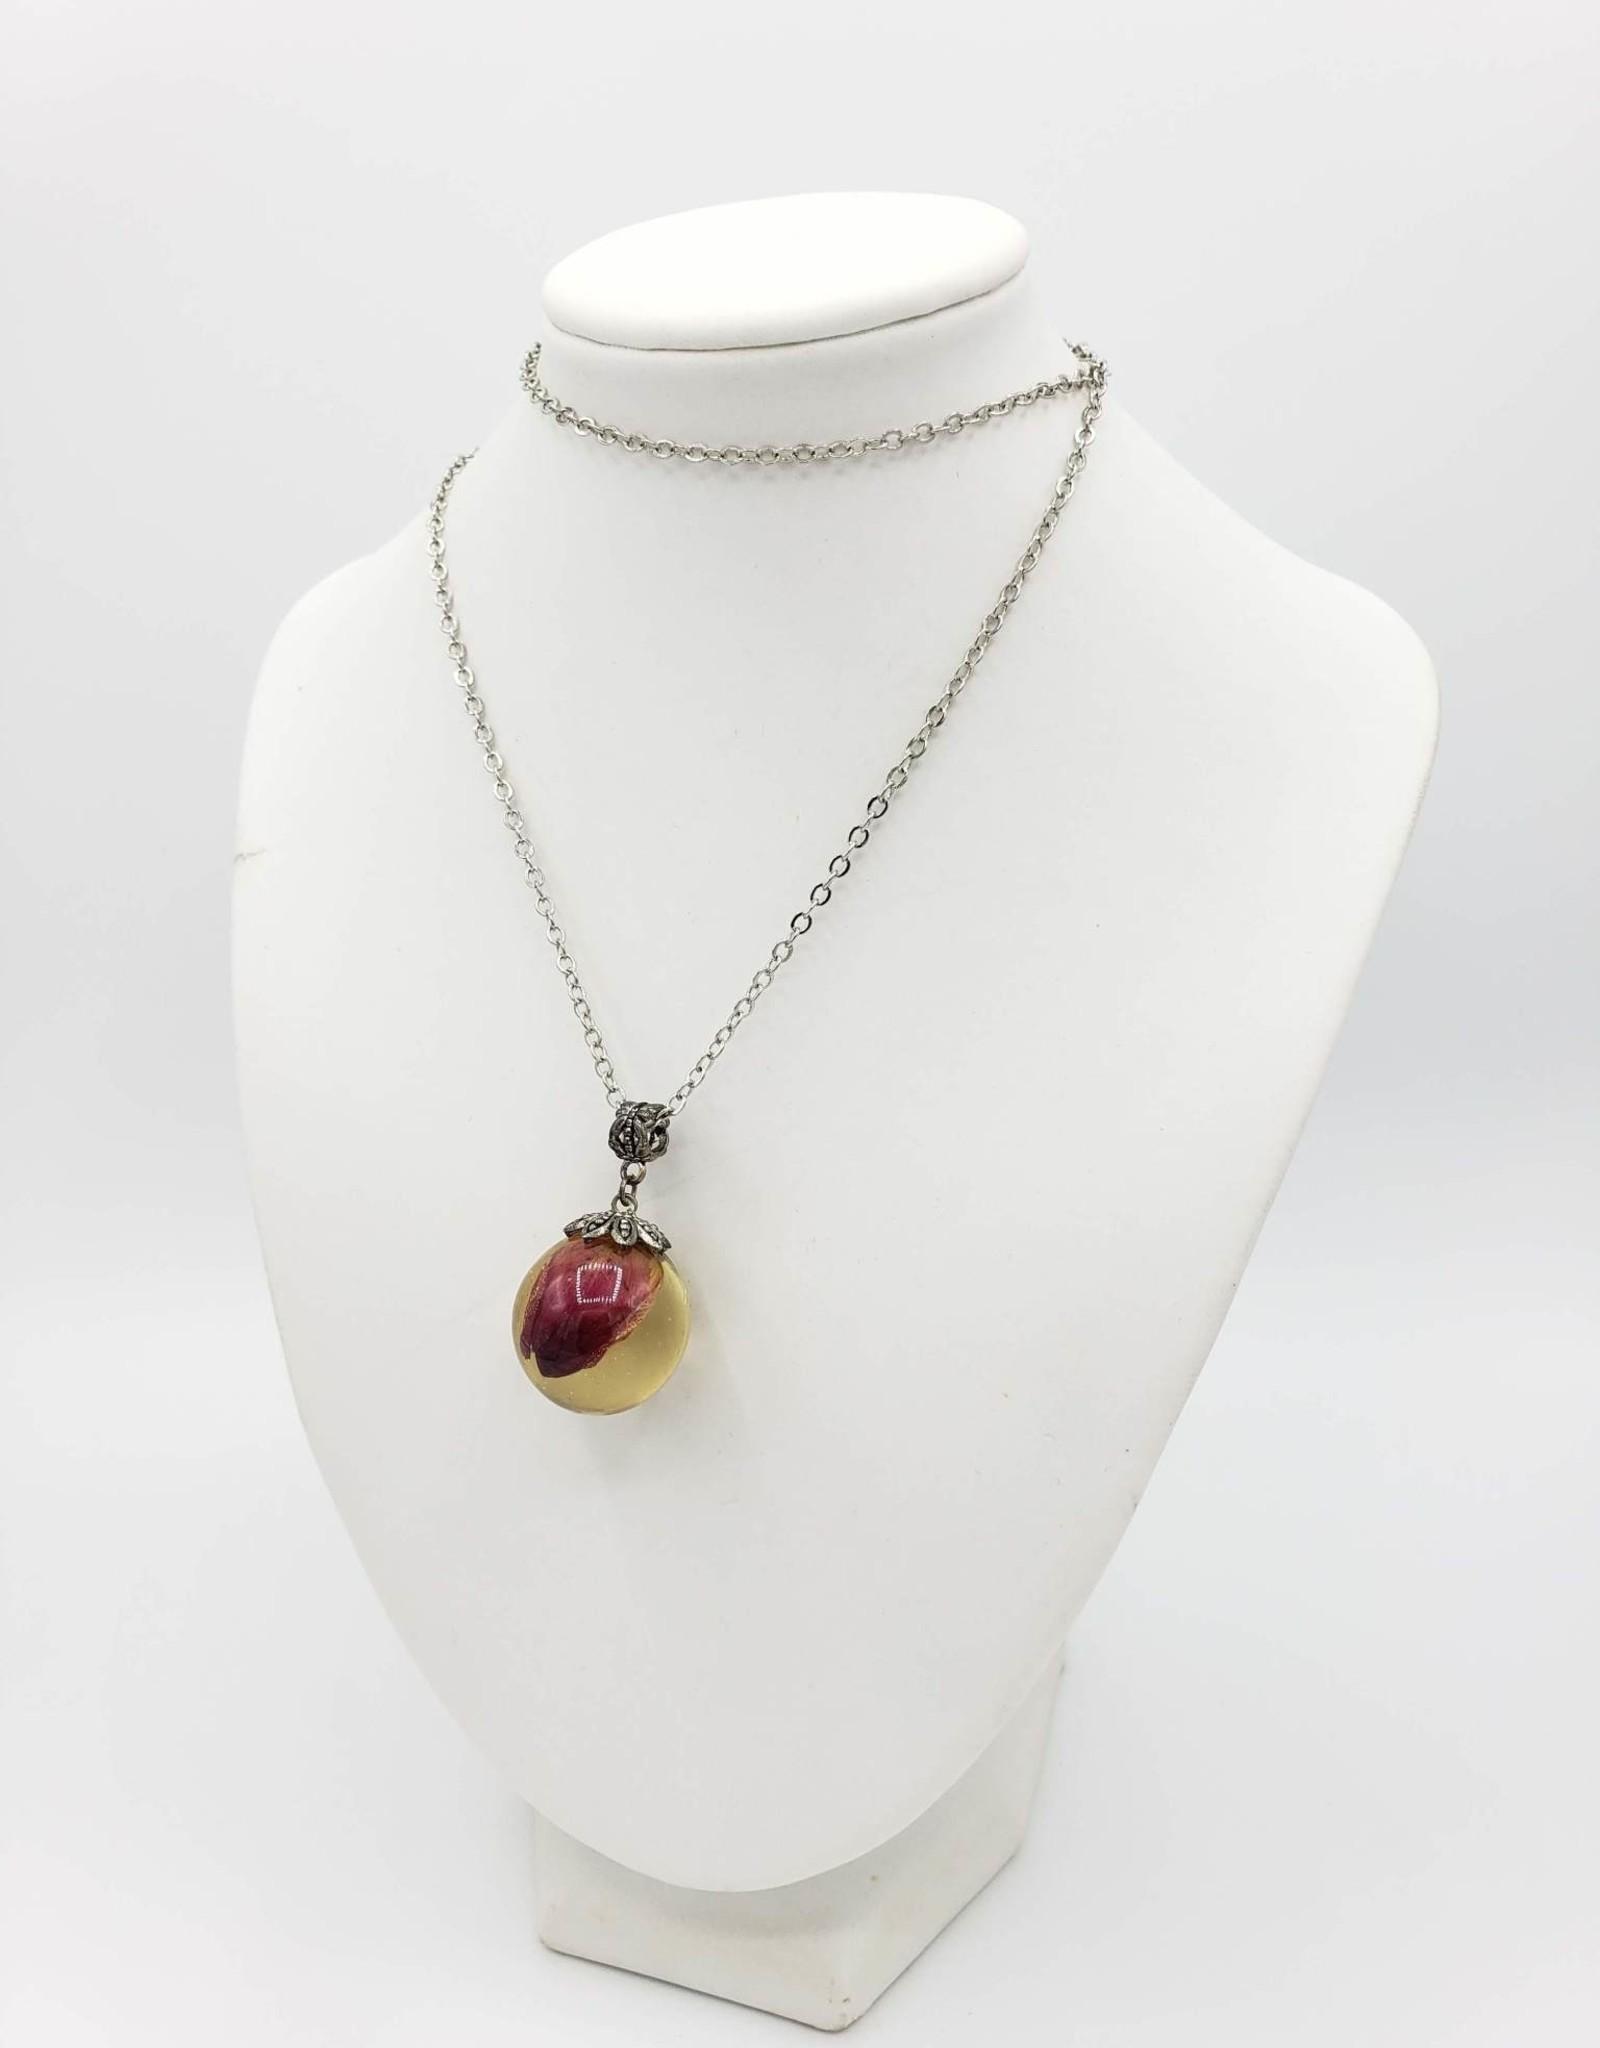 Rosebud Orb Resin Necklace